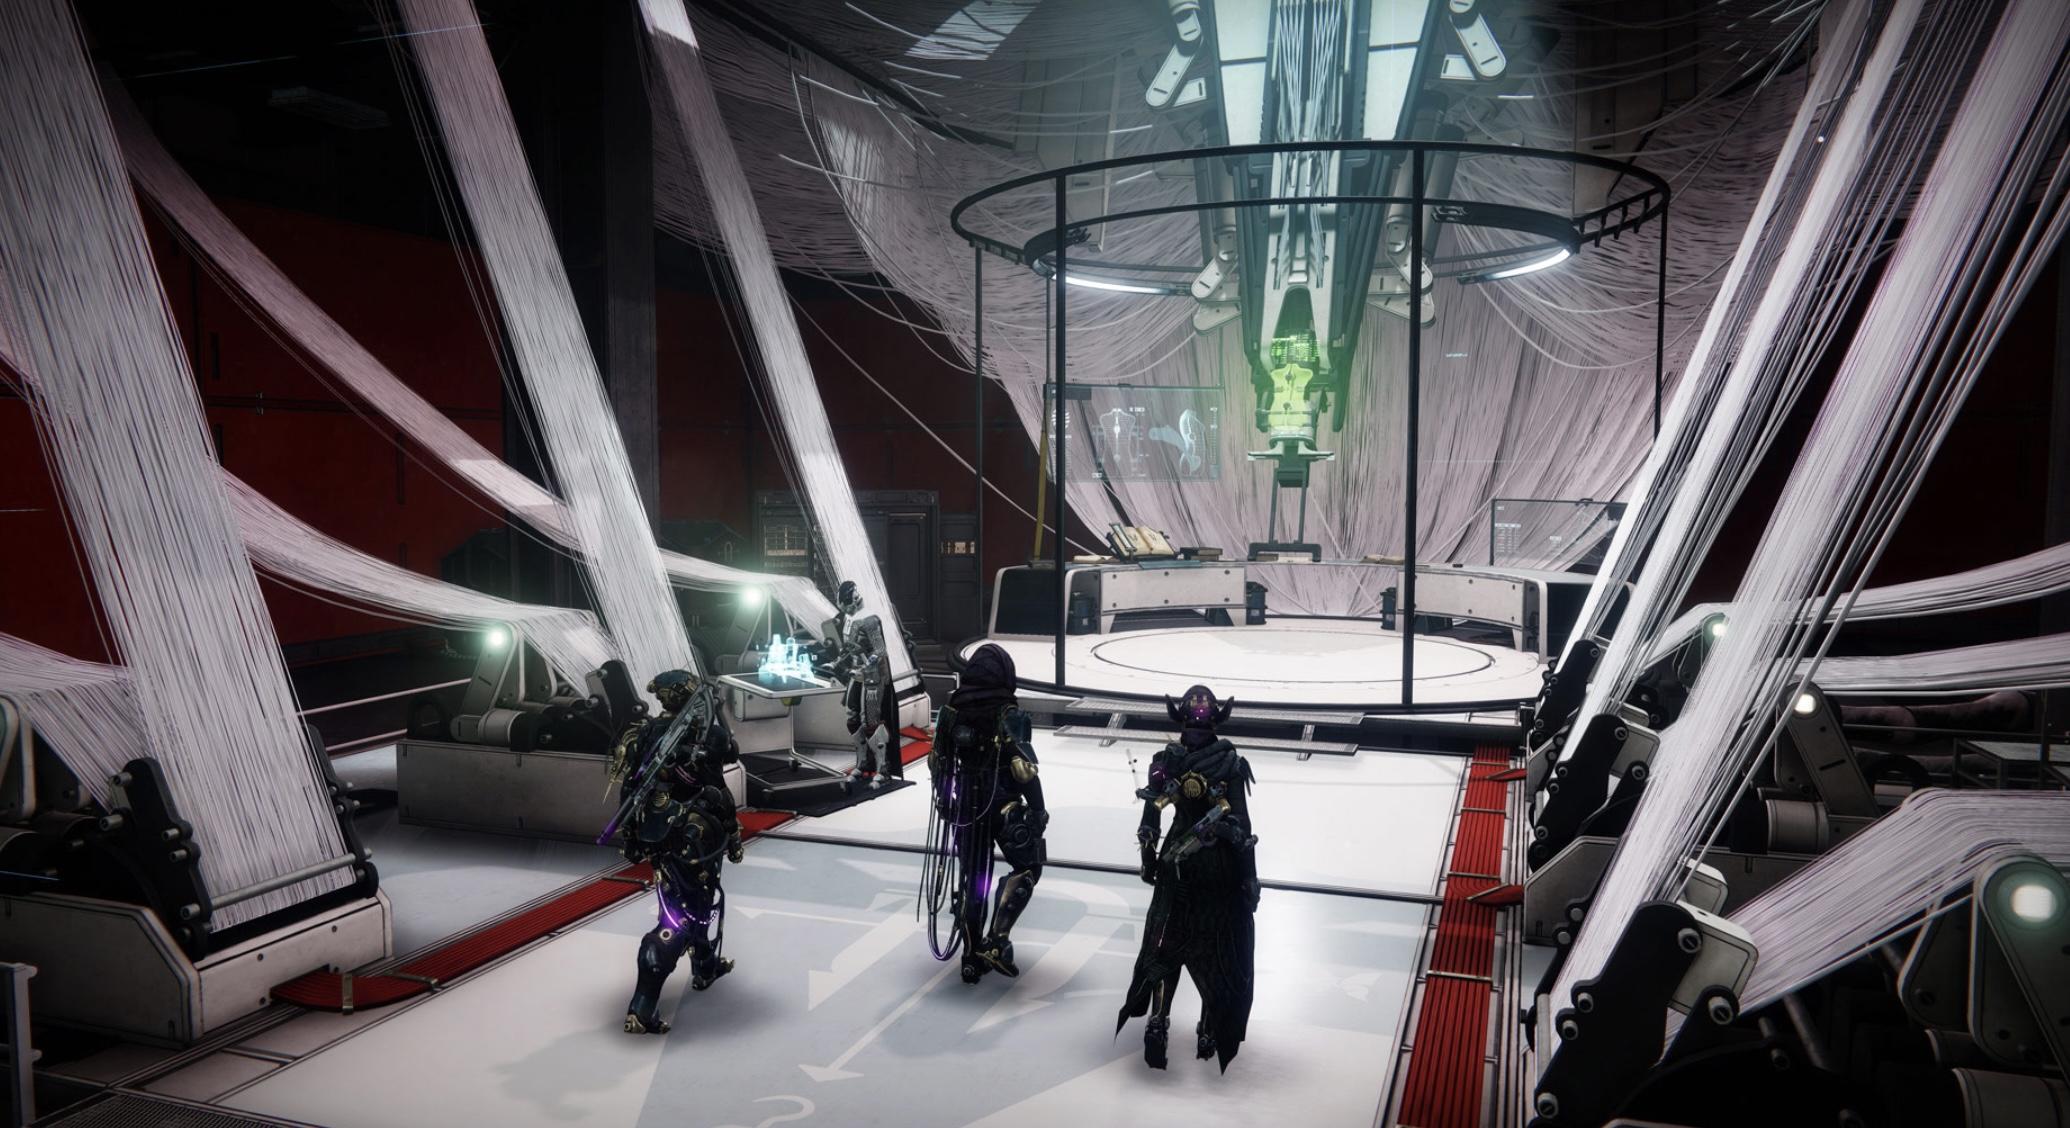 Destiny 2 Update 3.2.0.1